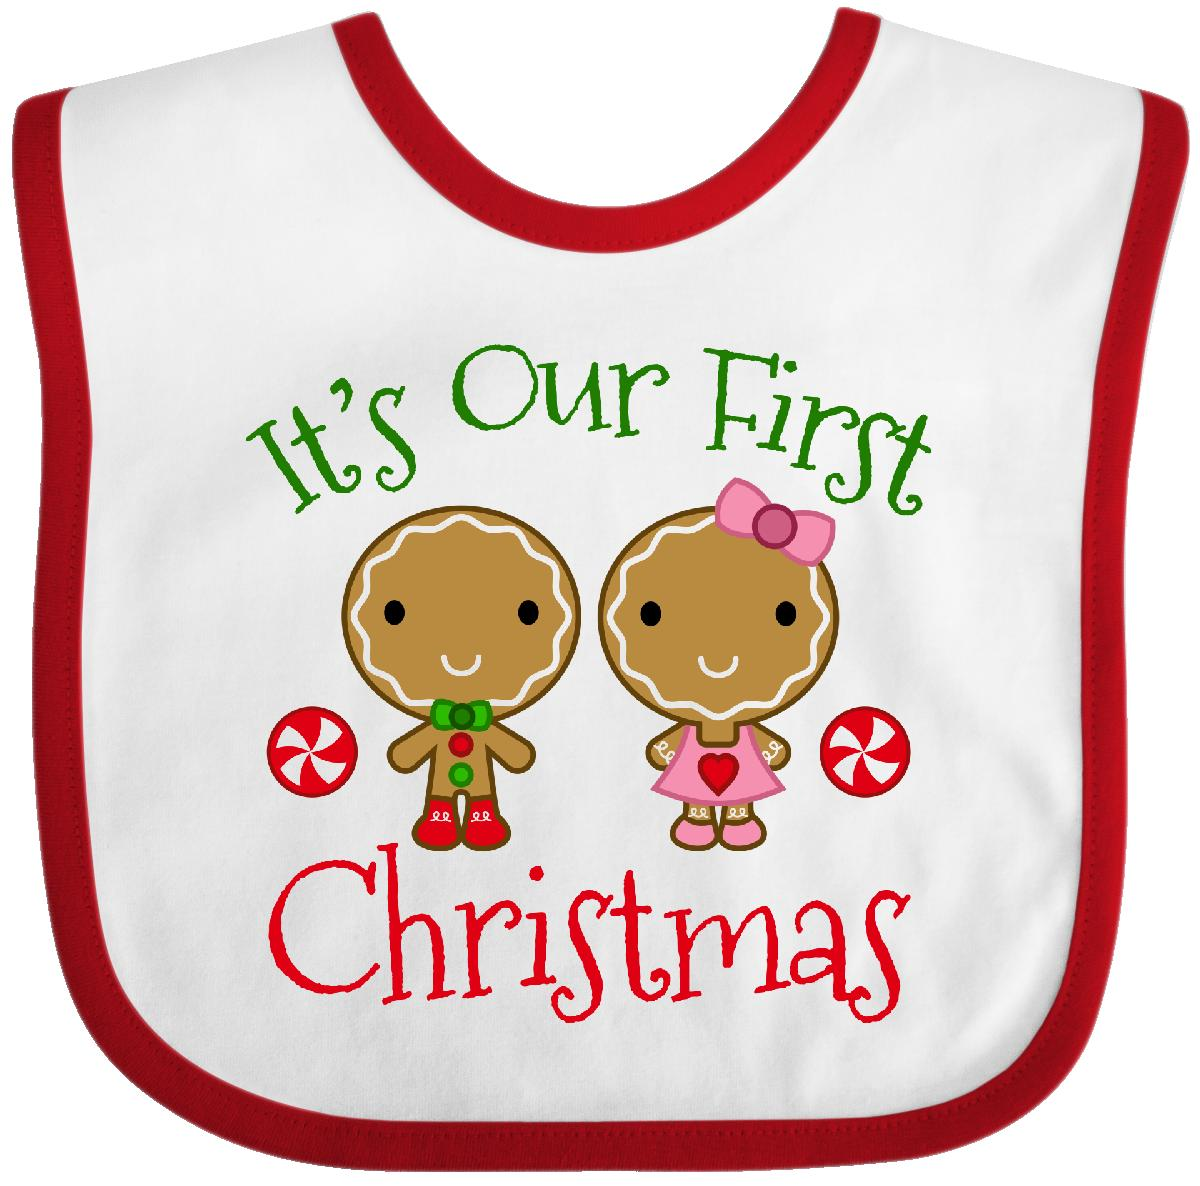 0564527349d7 Inktastic Christmas Boy Girl Twins Baby Bib Holiday Gingerbread ...